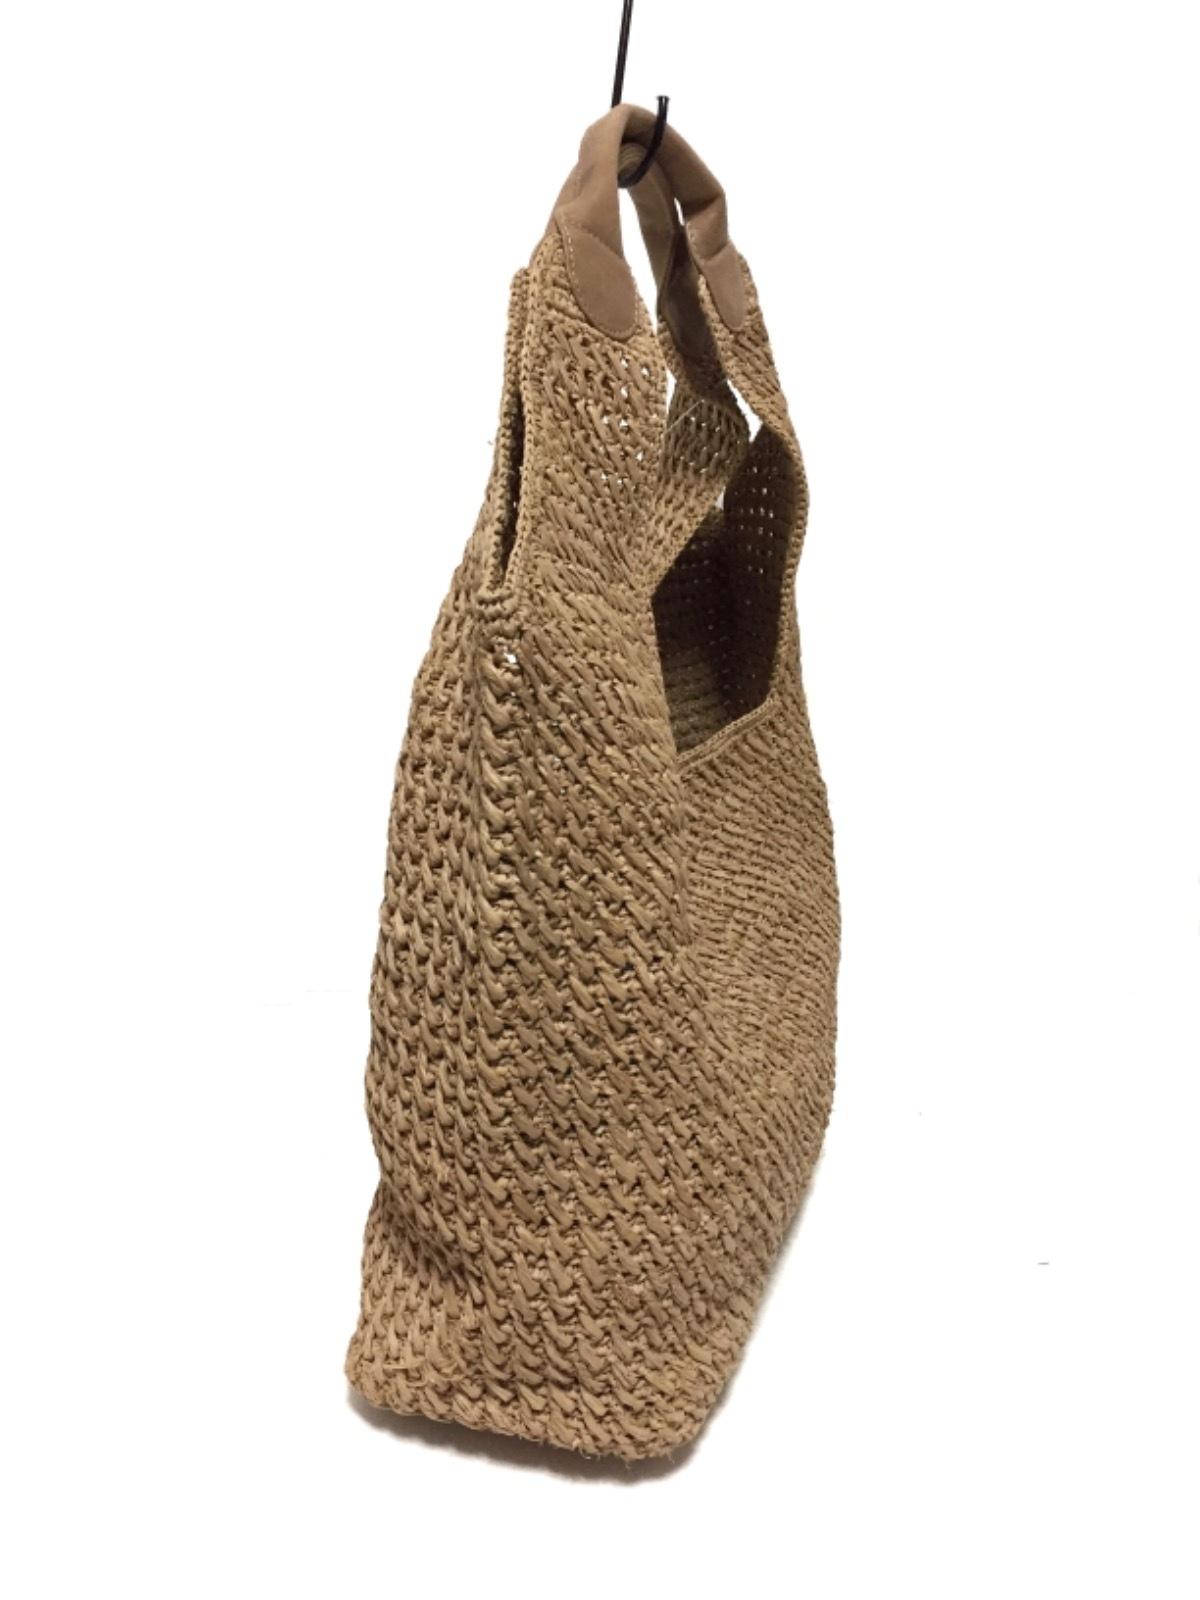 HELEN KAMINSKI(ヘレンカミンスキー)のショルダーバッグ